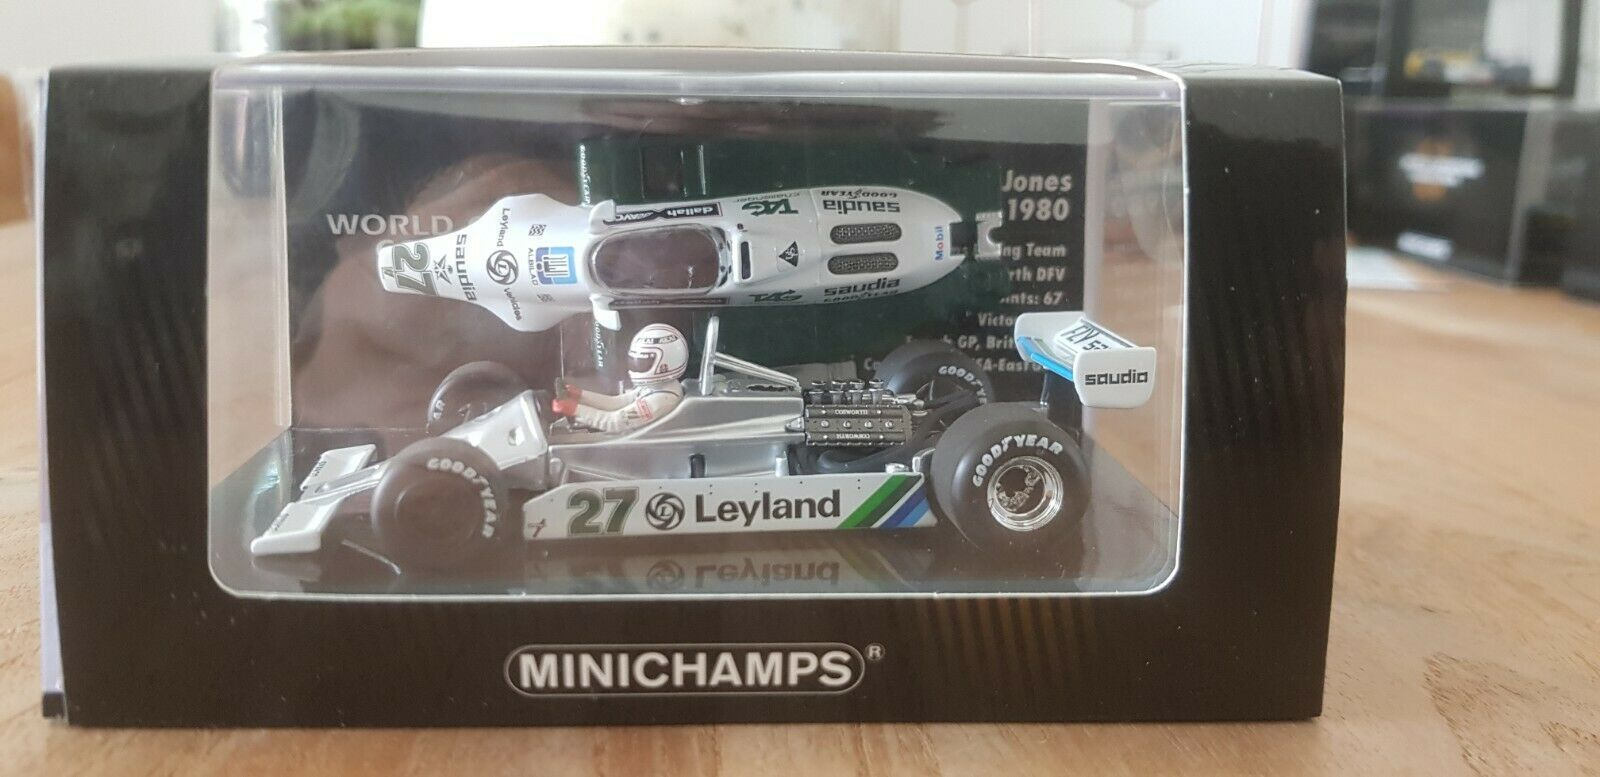 Minichamps -  Alan Jones - Williams - FW07B - 1980 - World Champion - 1 43